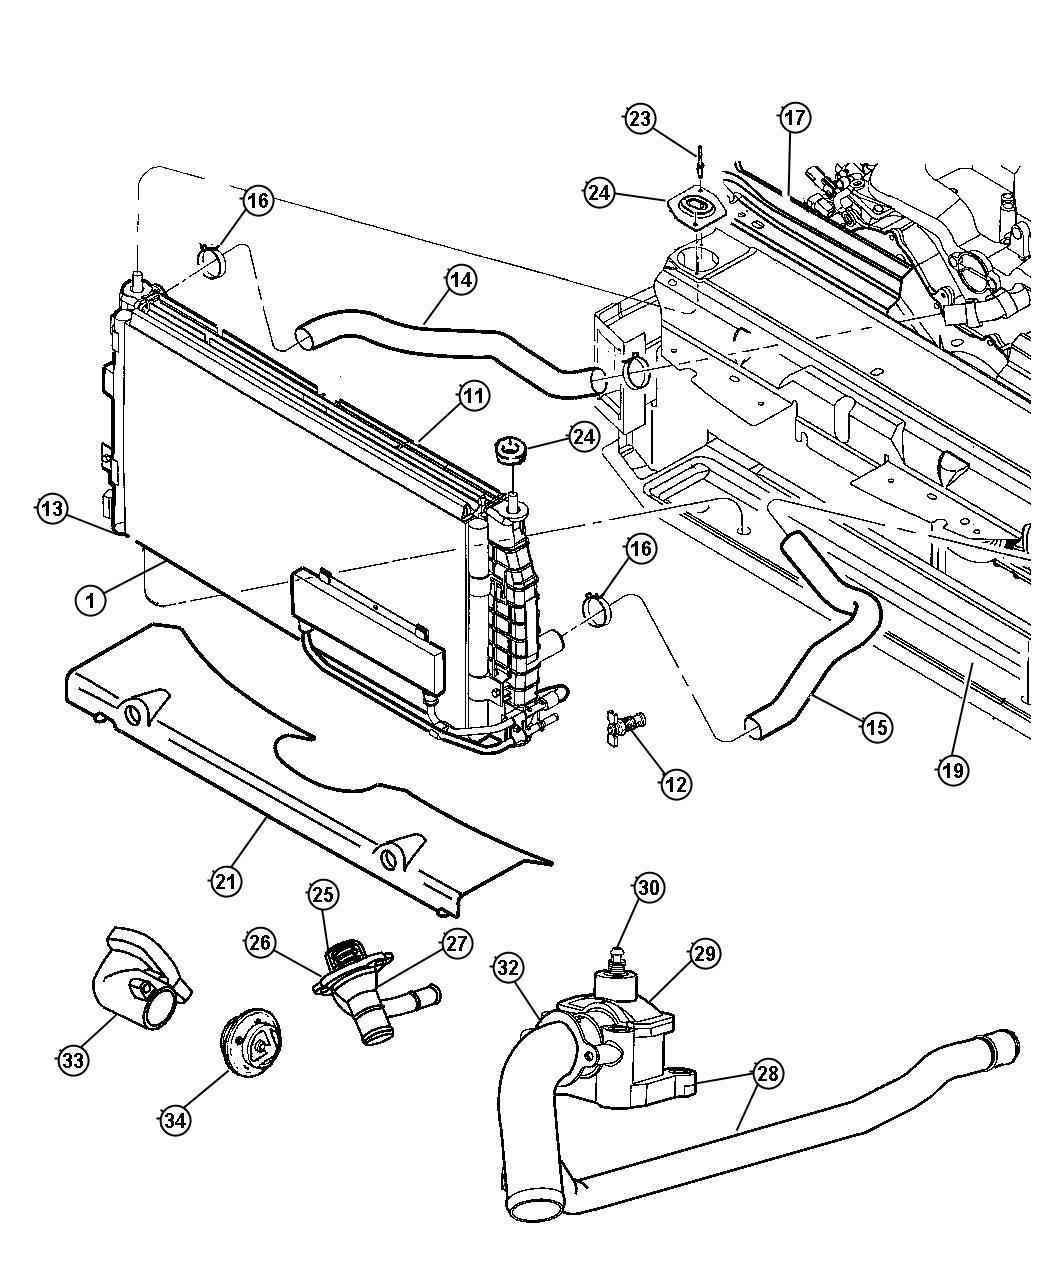 2000 chrysler concorde radiator replacement